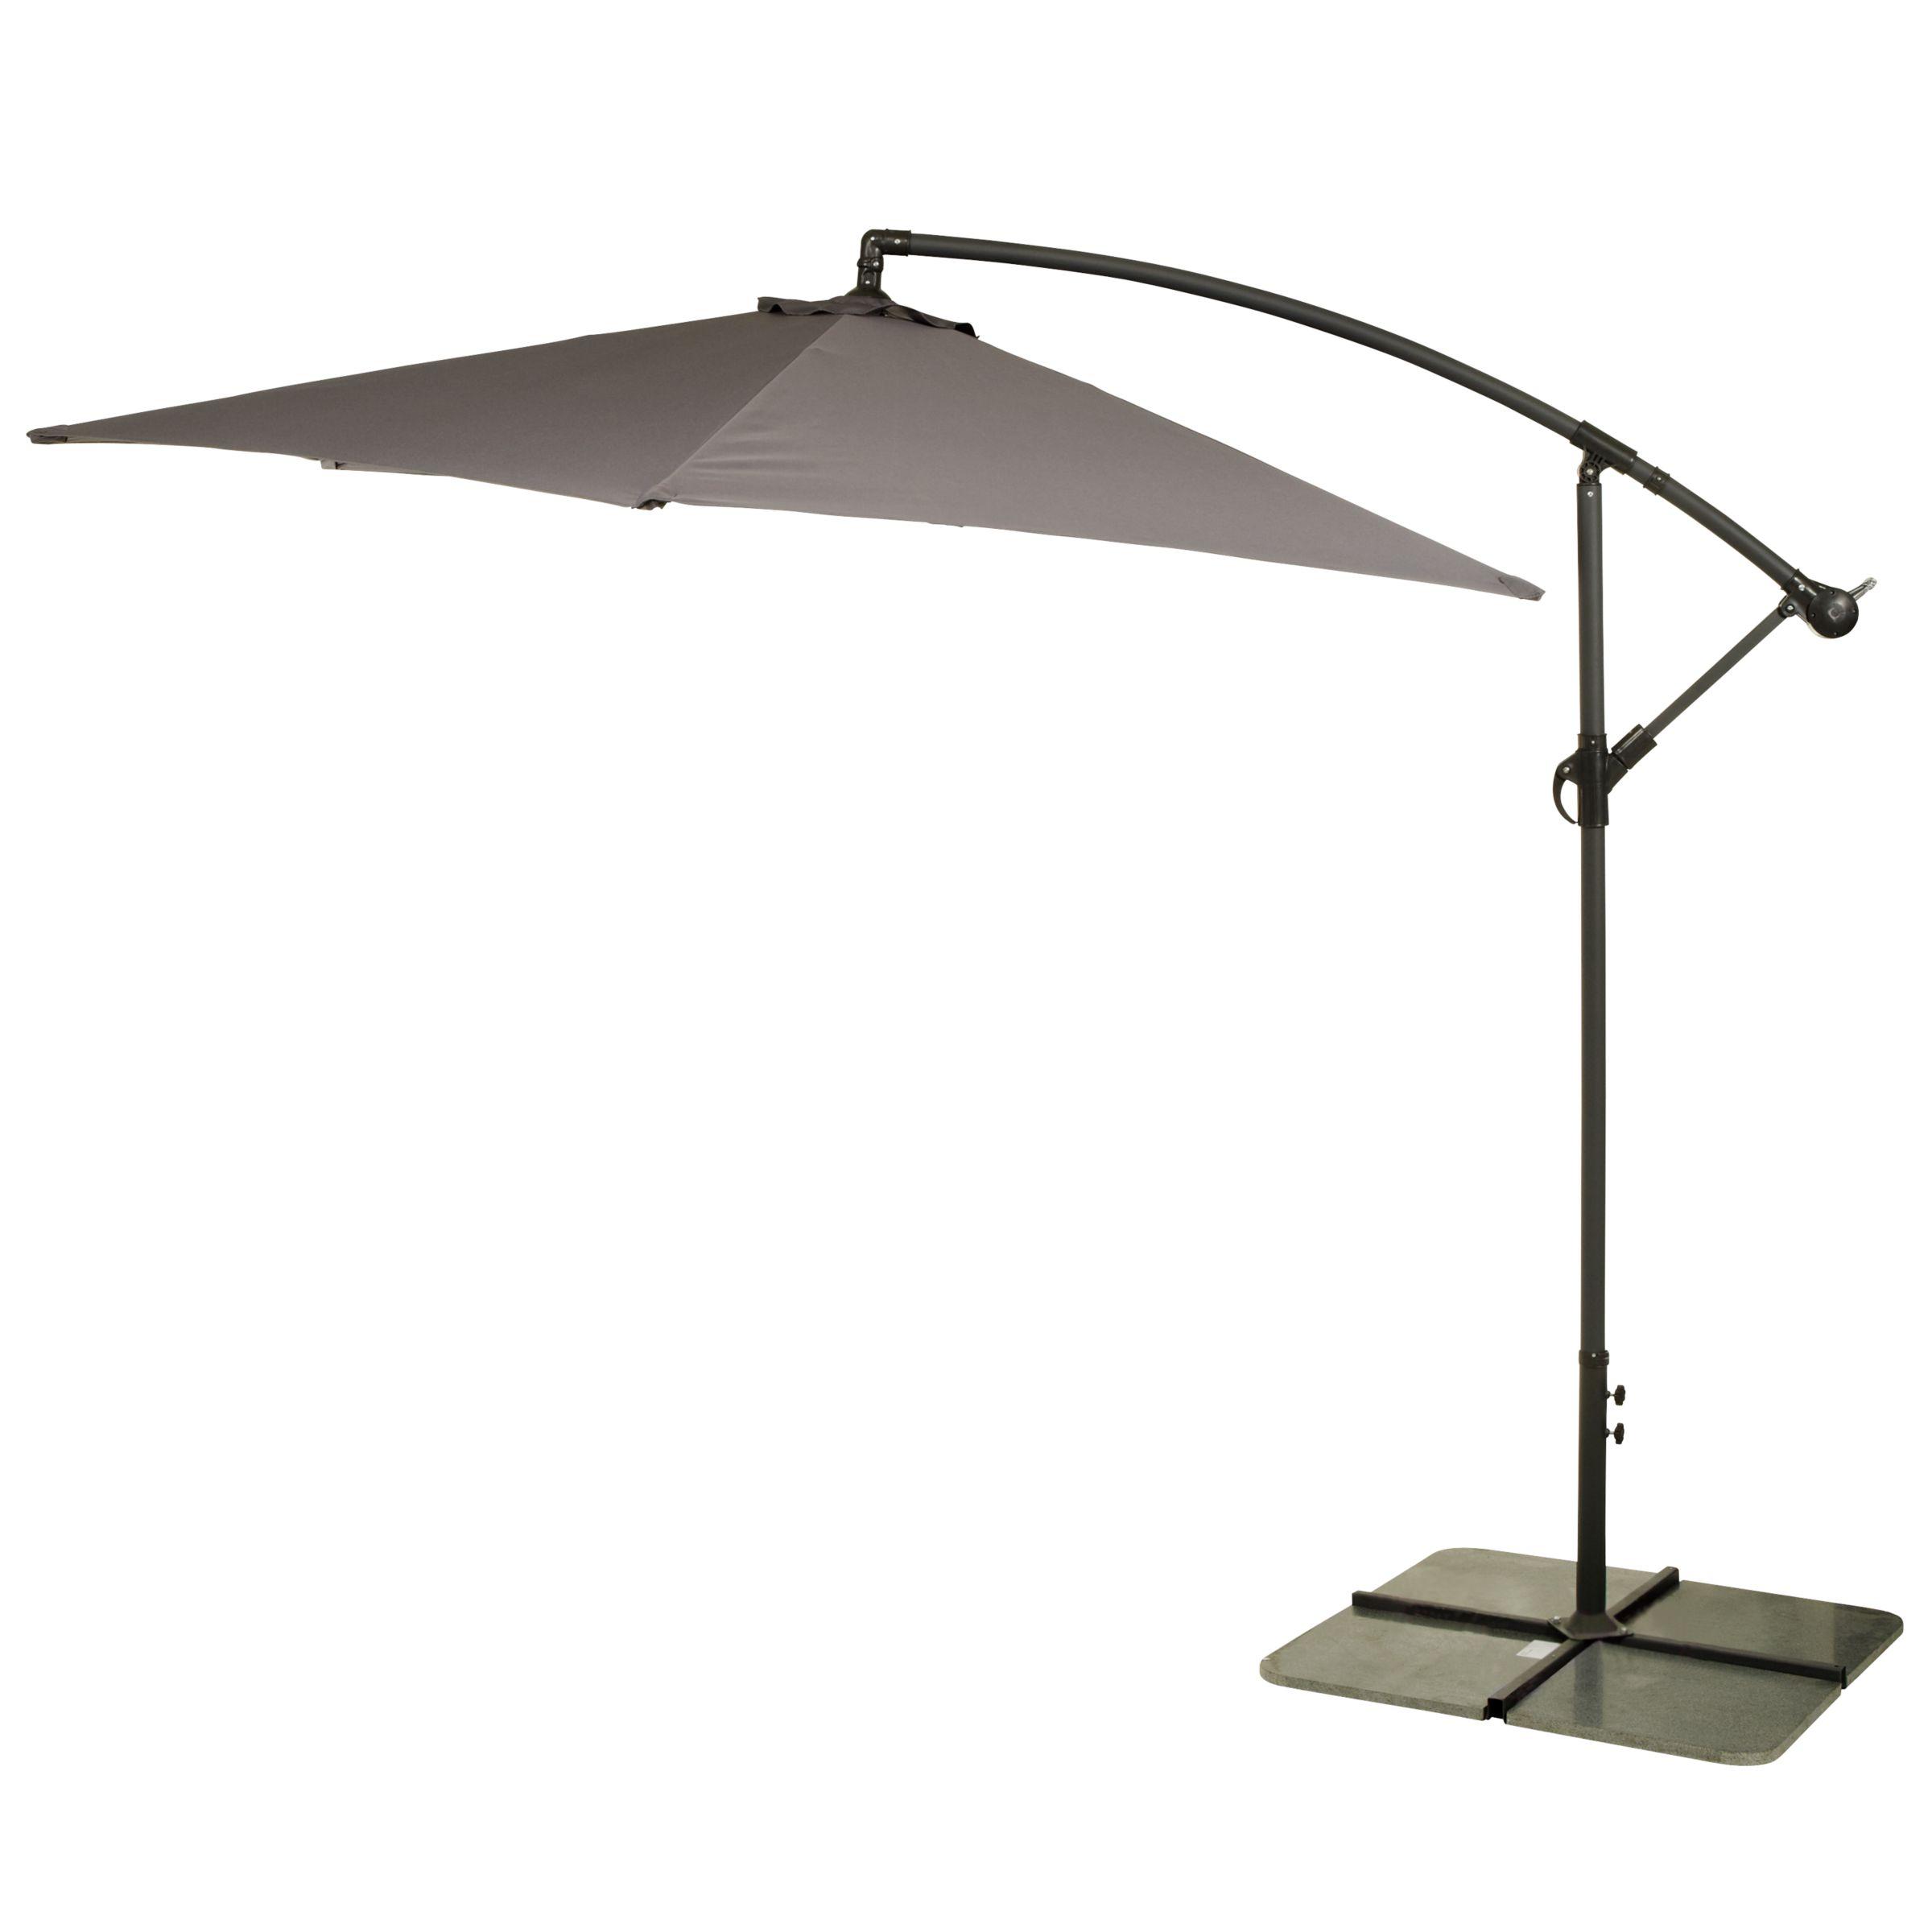 Freestanding Garden Parasol, Grey